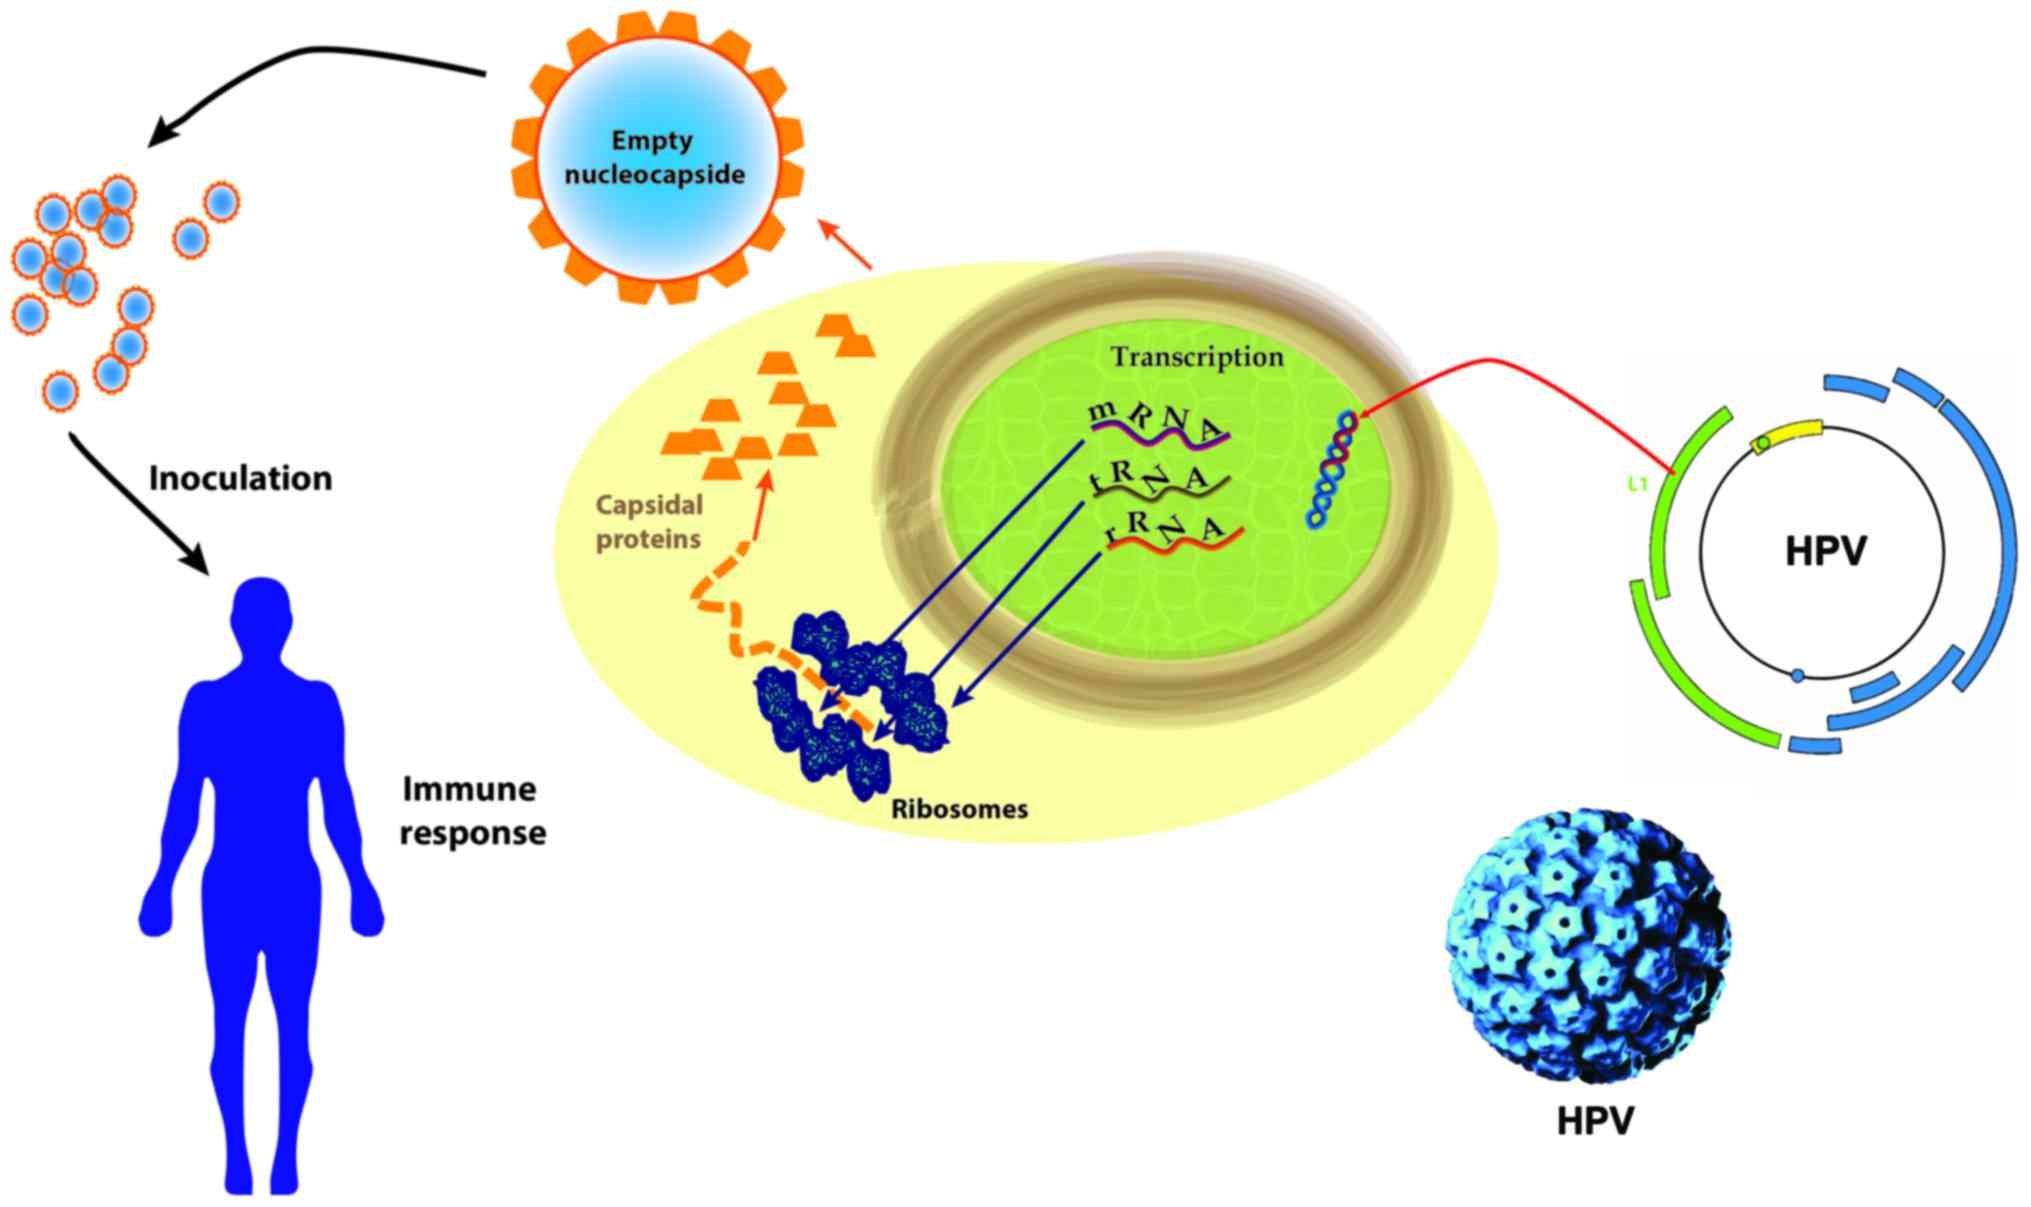 human papillomavirus (hpv) especially strains 16 and 18)